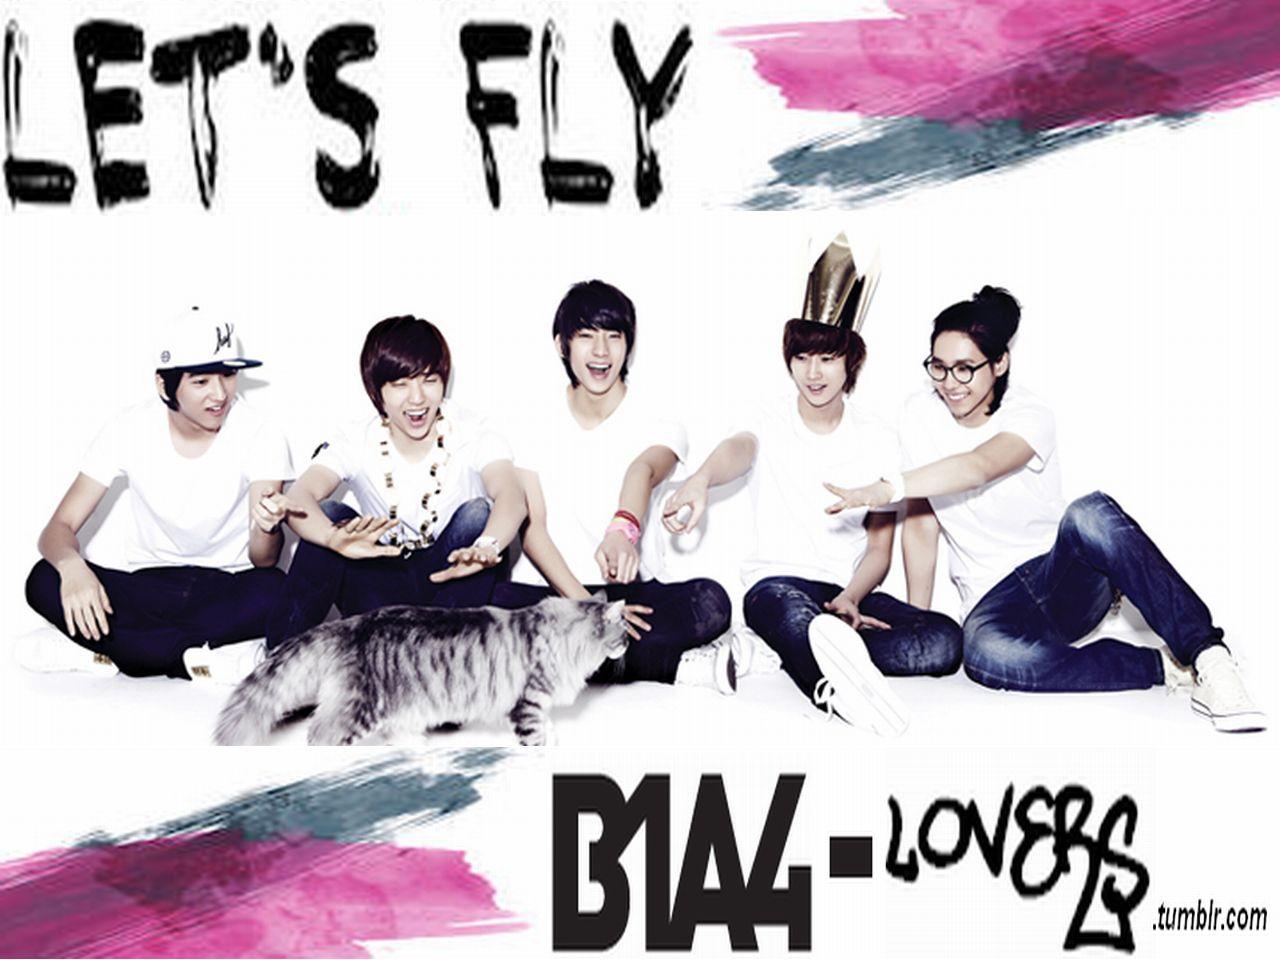 B1A4 B1a4-lovers